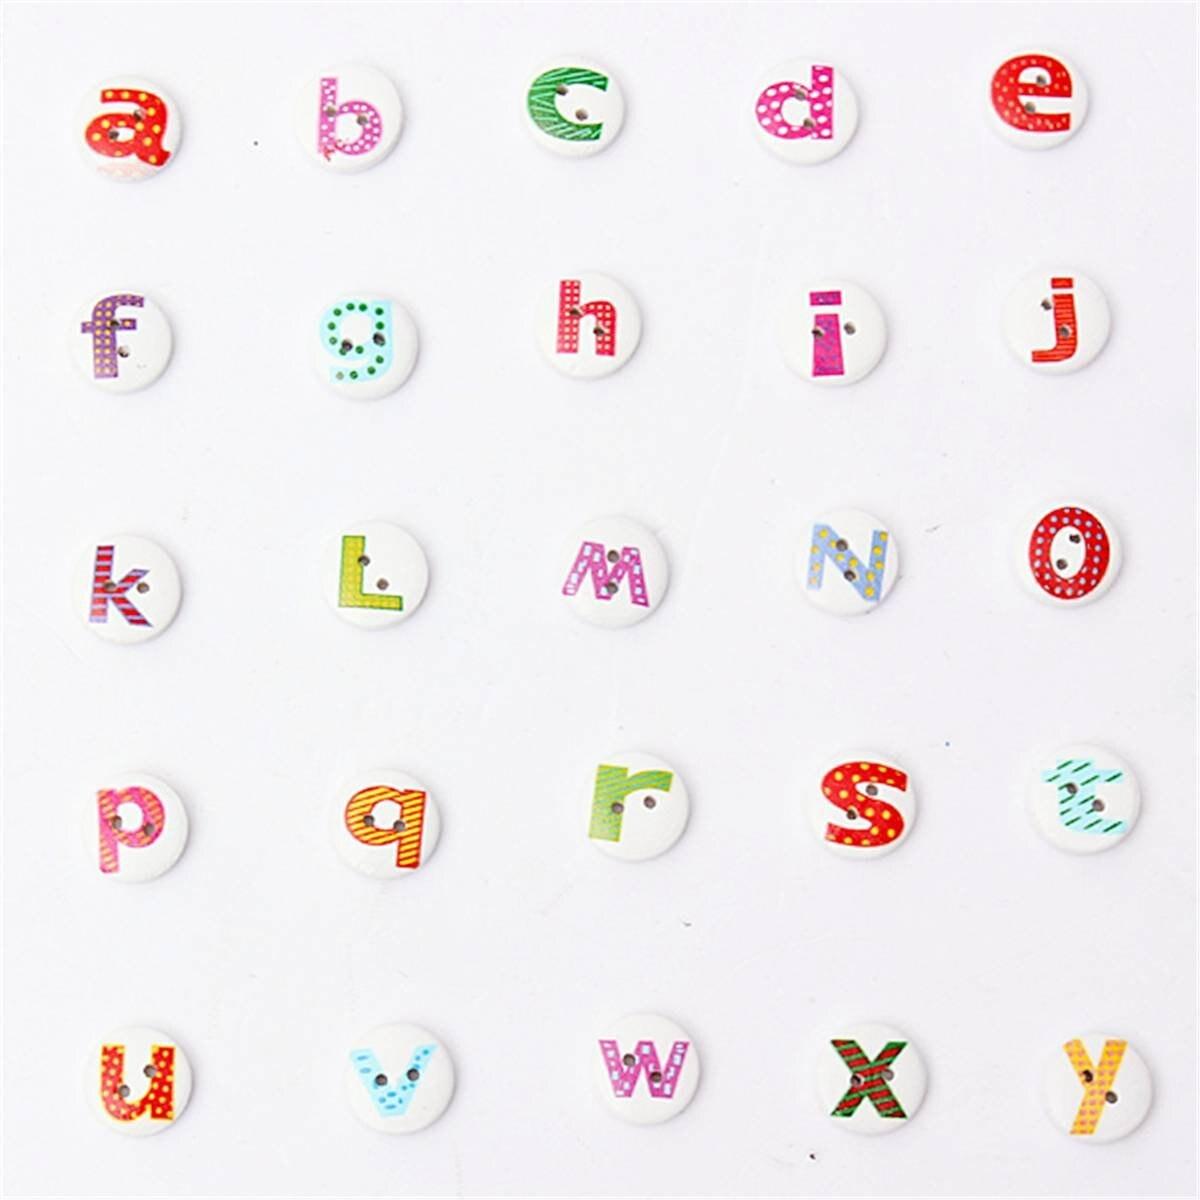 Boutique 100Pcs Mixed Painted Letter Alphabet Wooden Sewing Button Scrapbooking